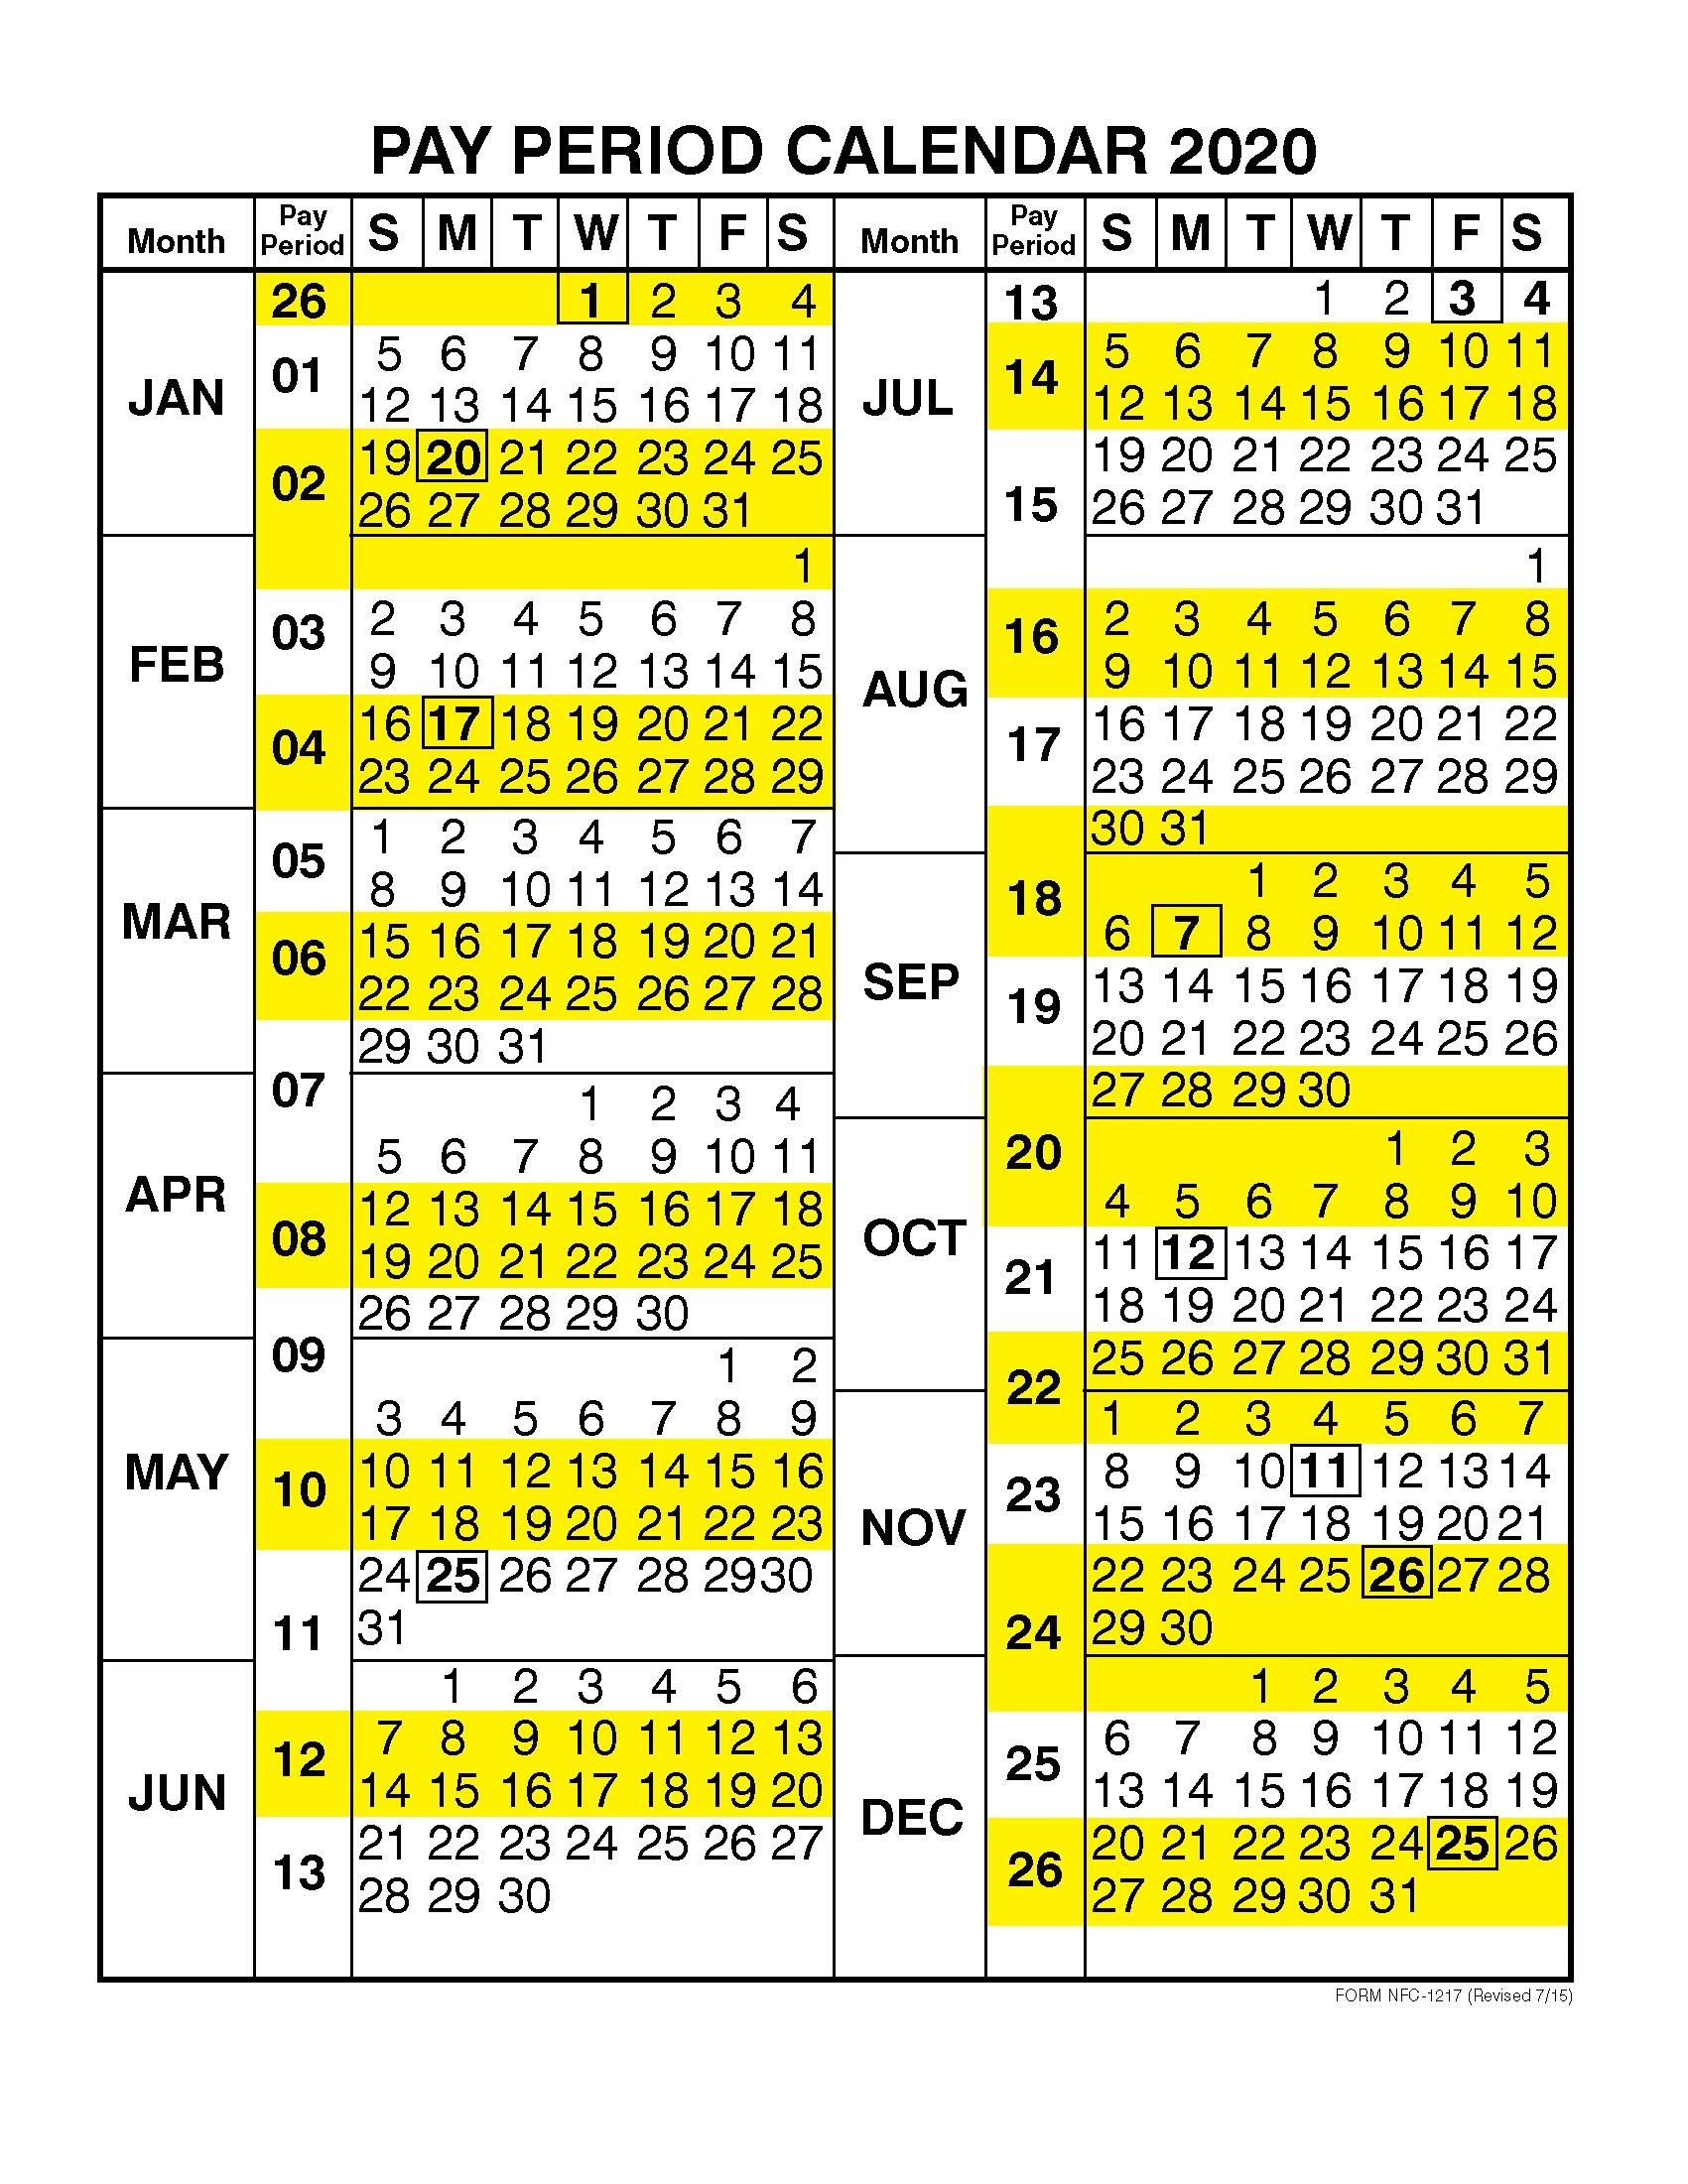 Pay Period Calendar 2020Calendar Year | Free Printable 2019  Federal Pay Period Calendar 2020